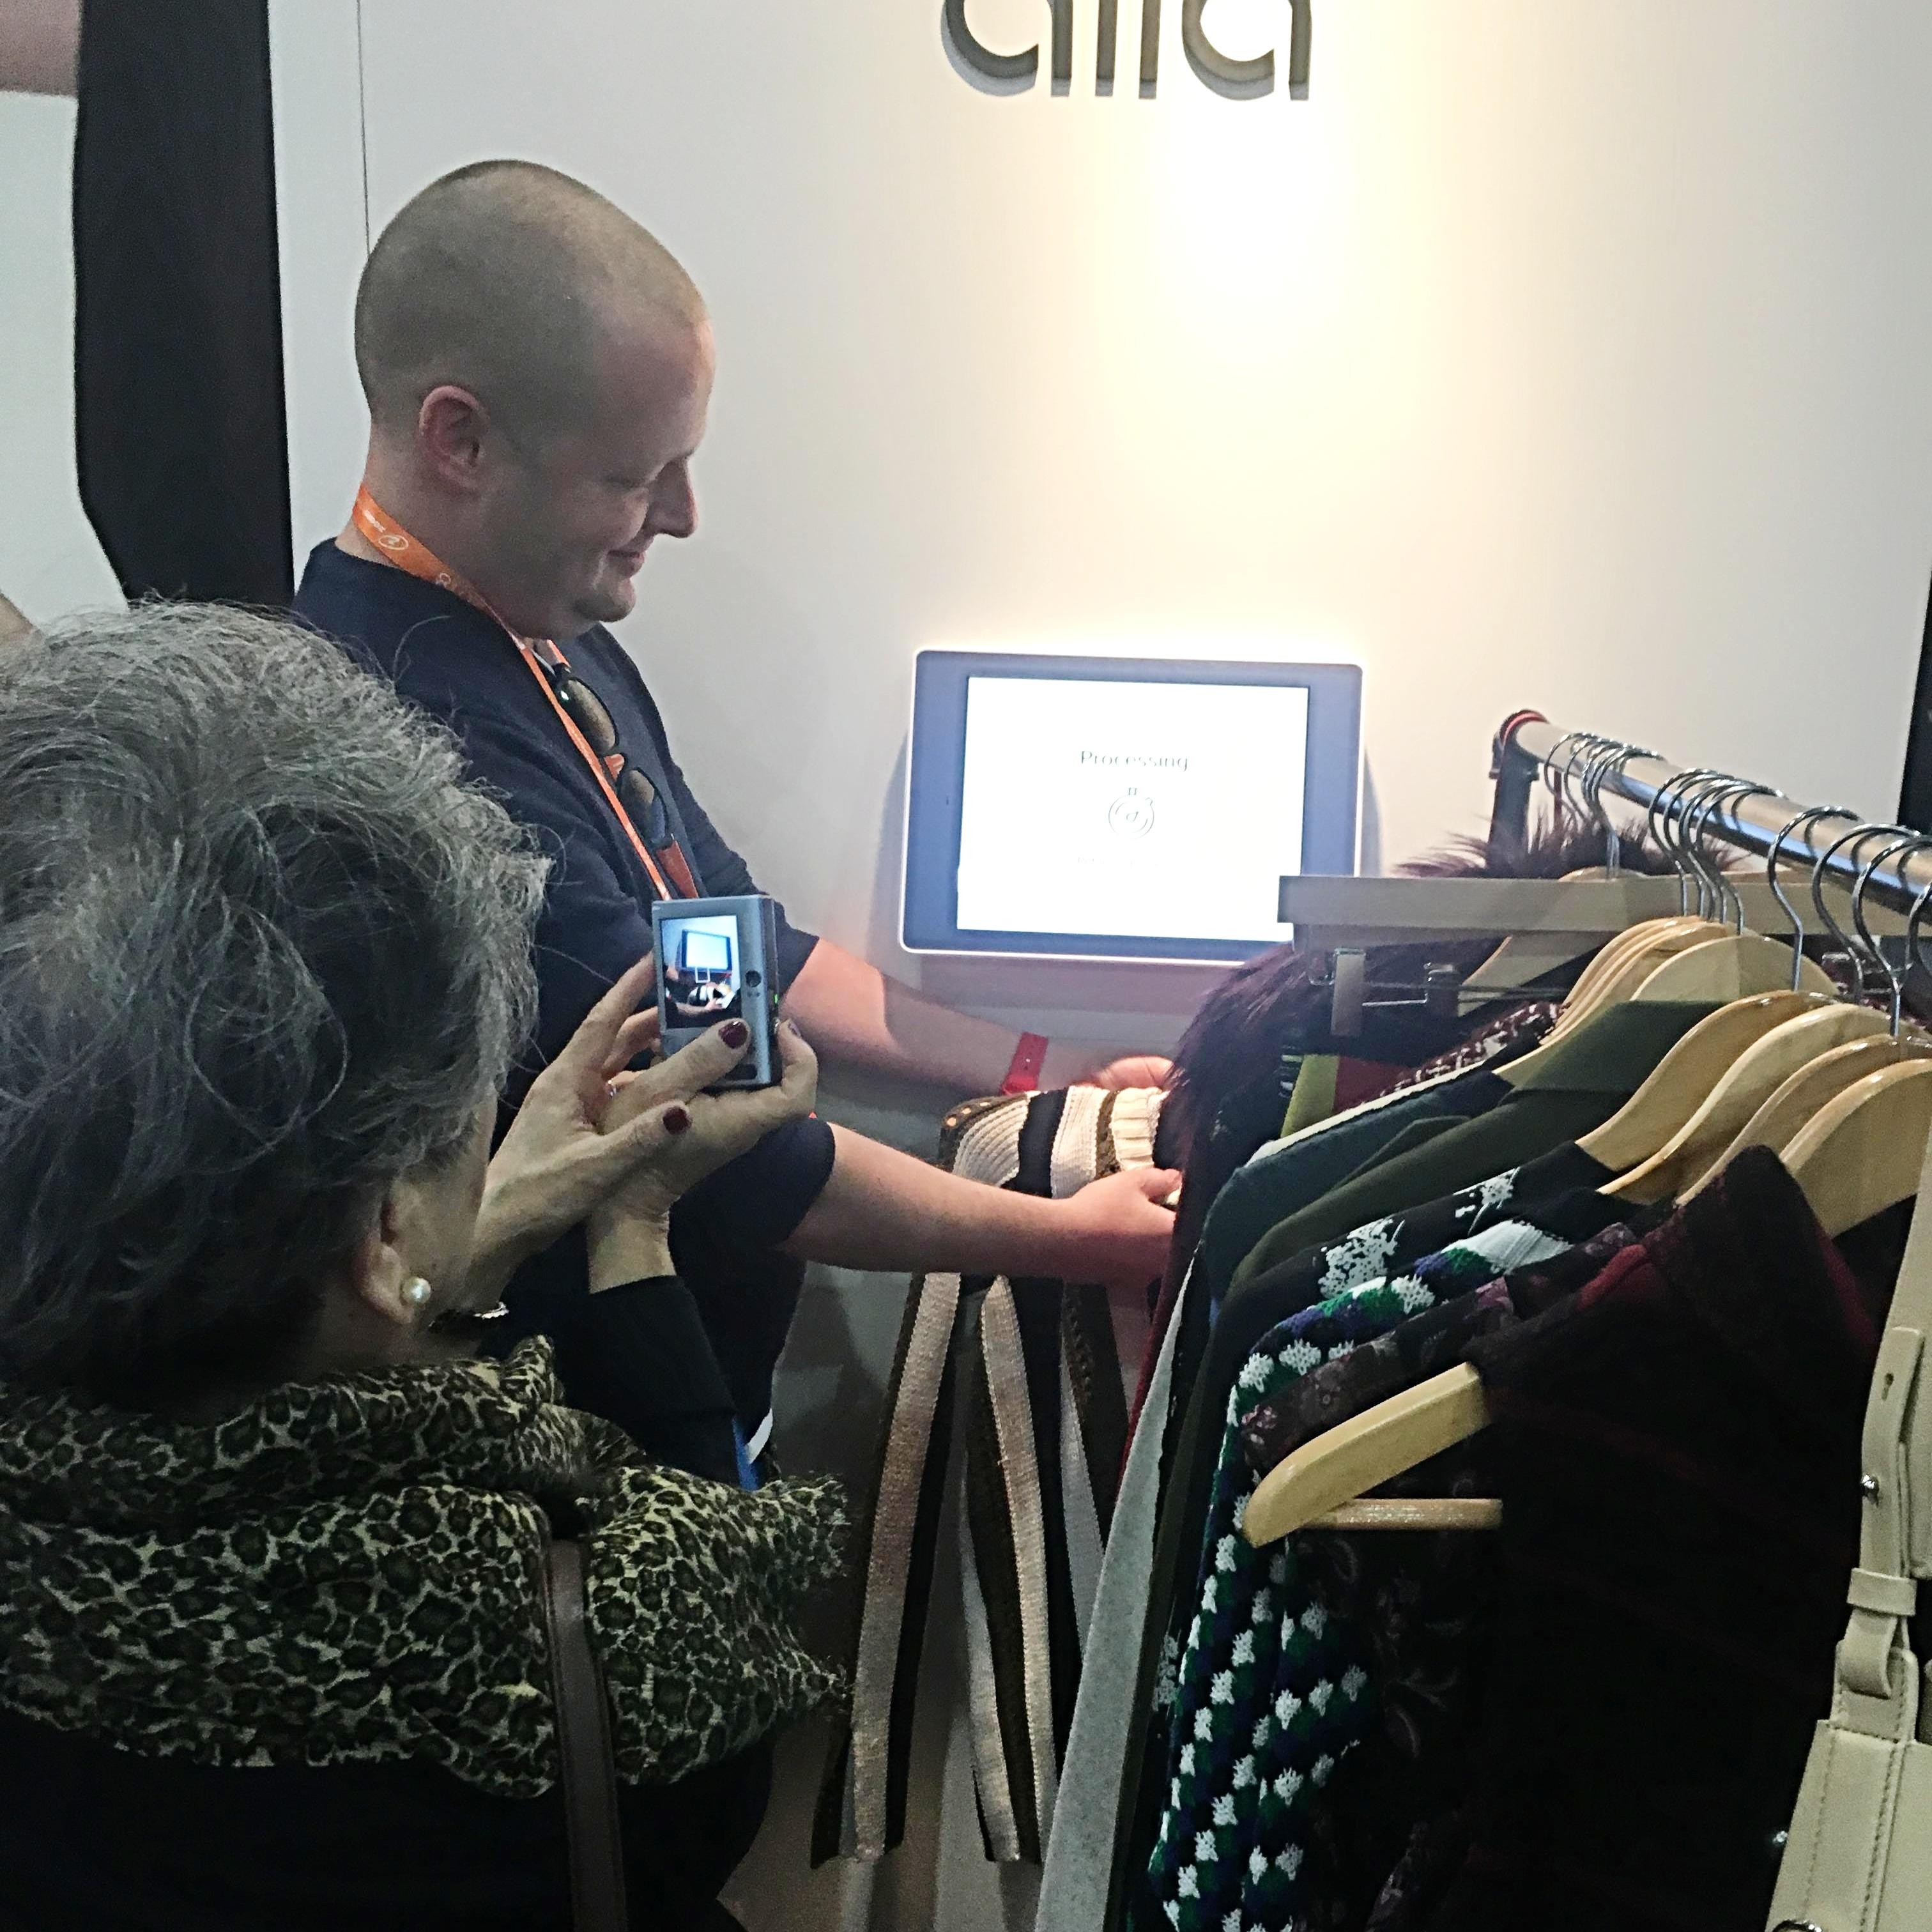 Hampton Catlin demos Rent the Runway's self-service product returns with Aila's Interactive Kiosk.